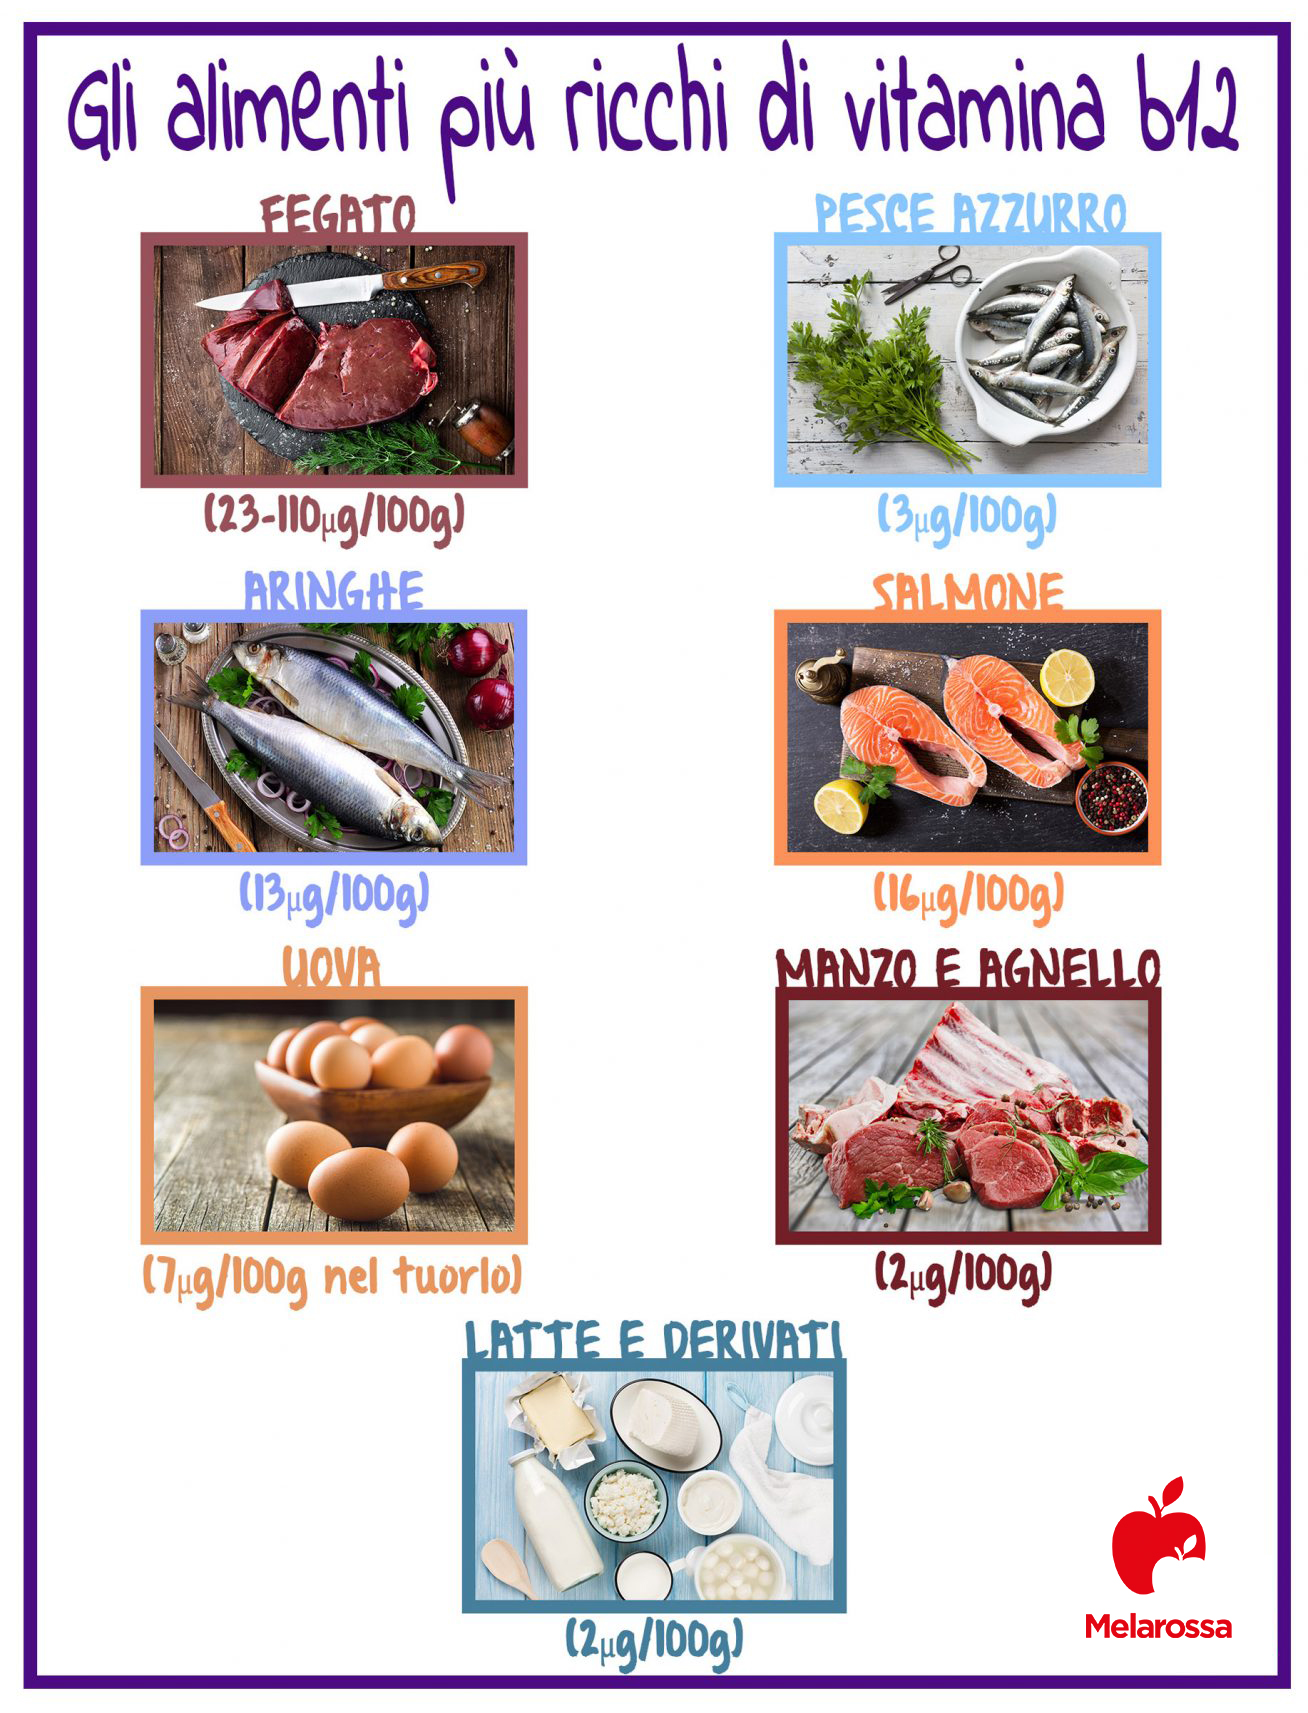 alimenti più ricchi di vitamina B12